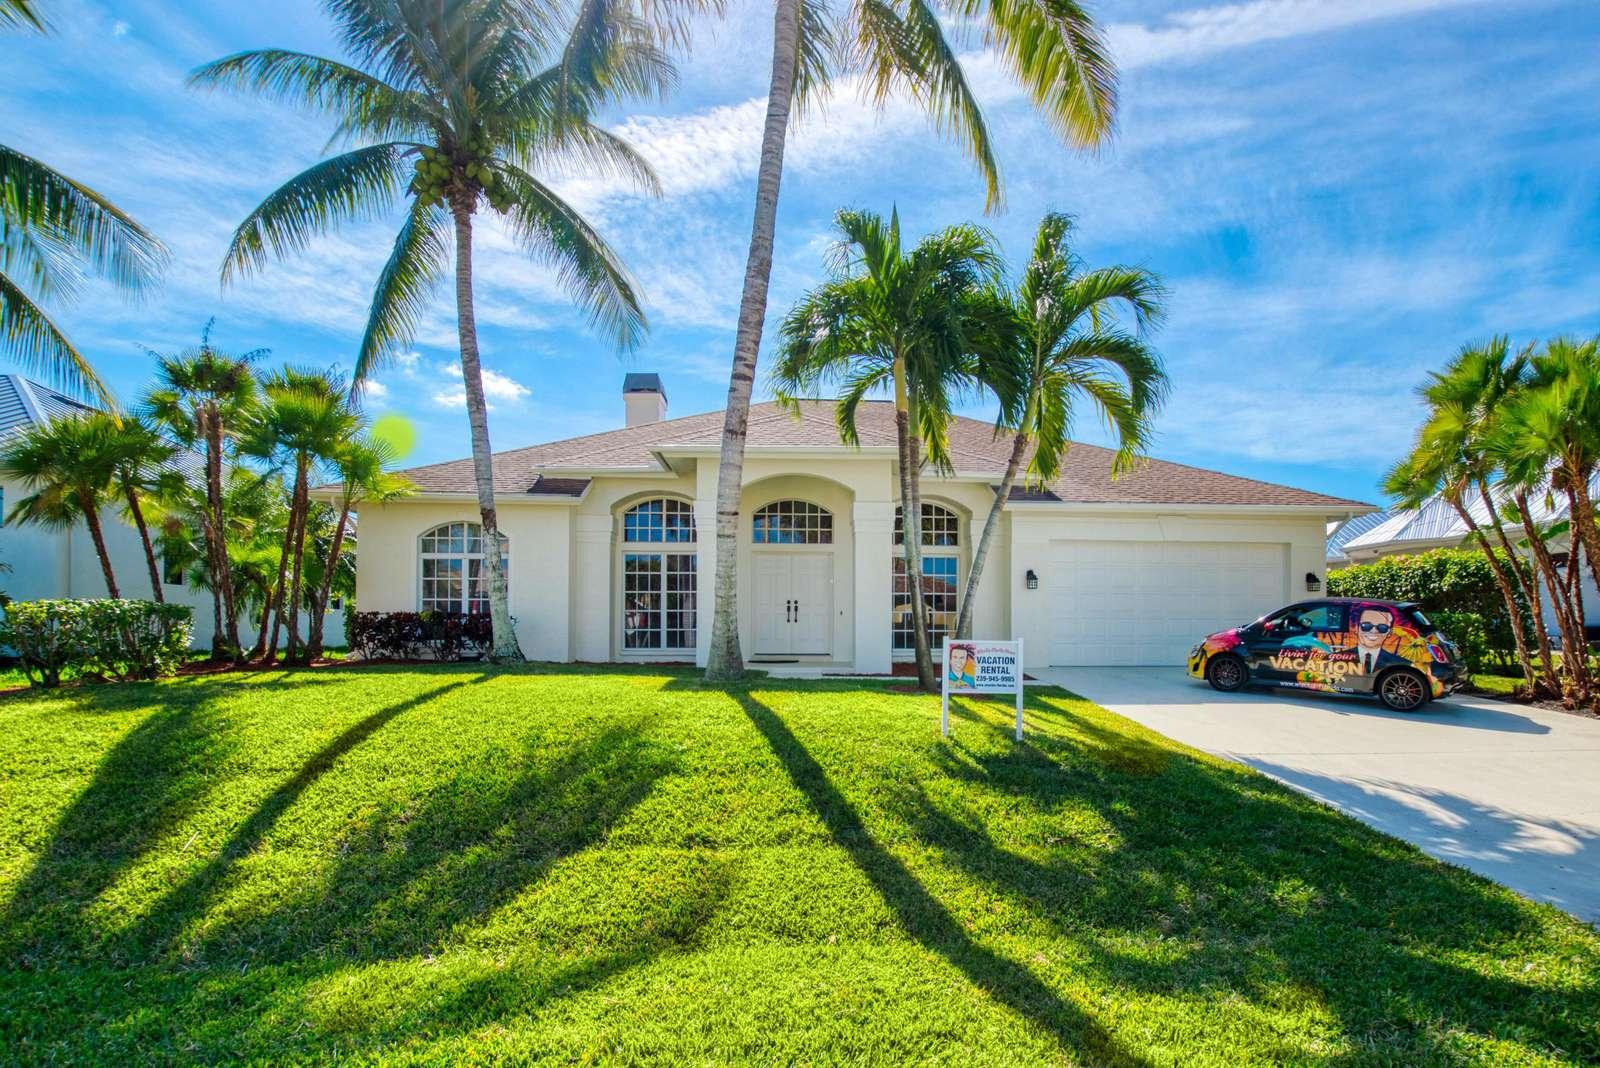 Wischis Florida Home - Tropical Breeze